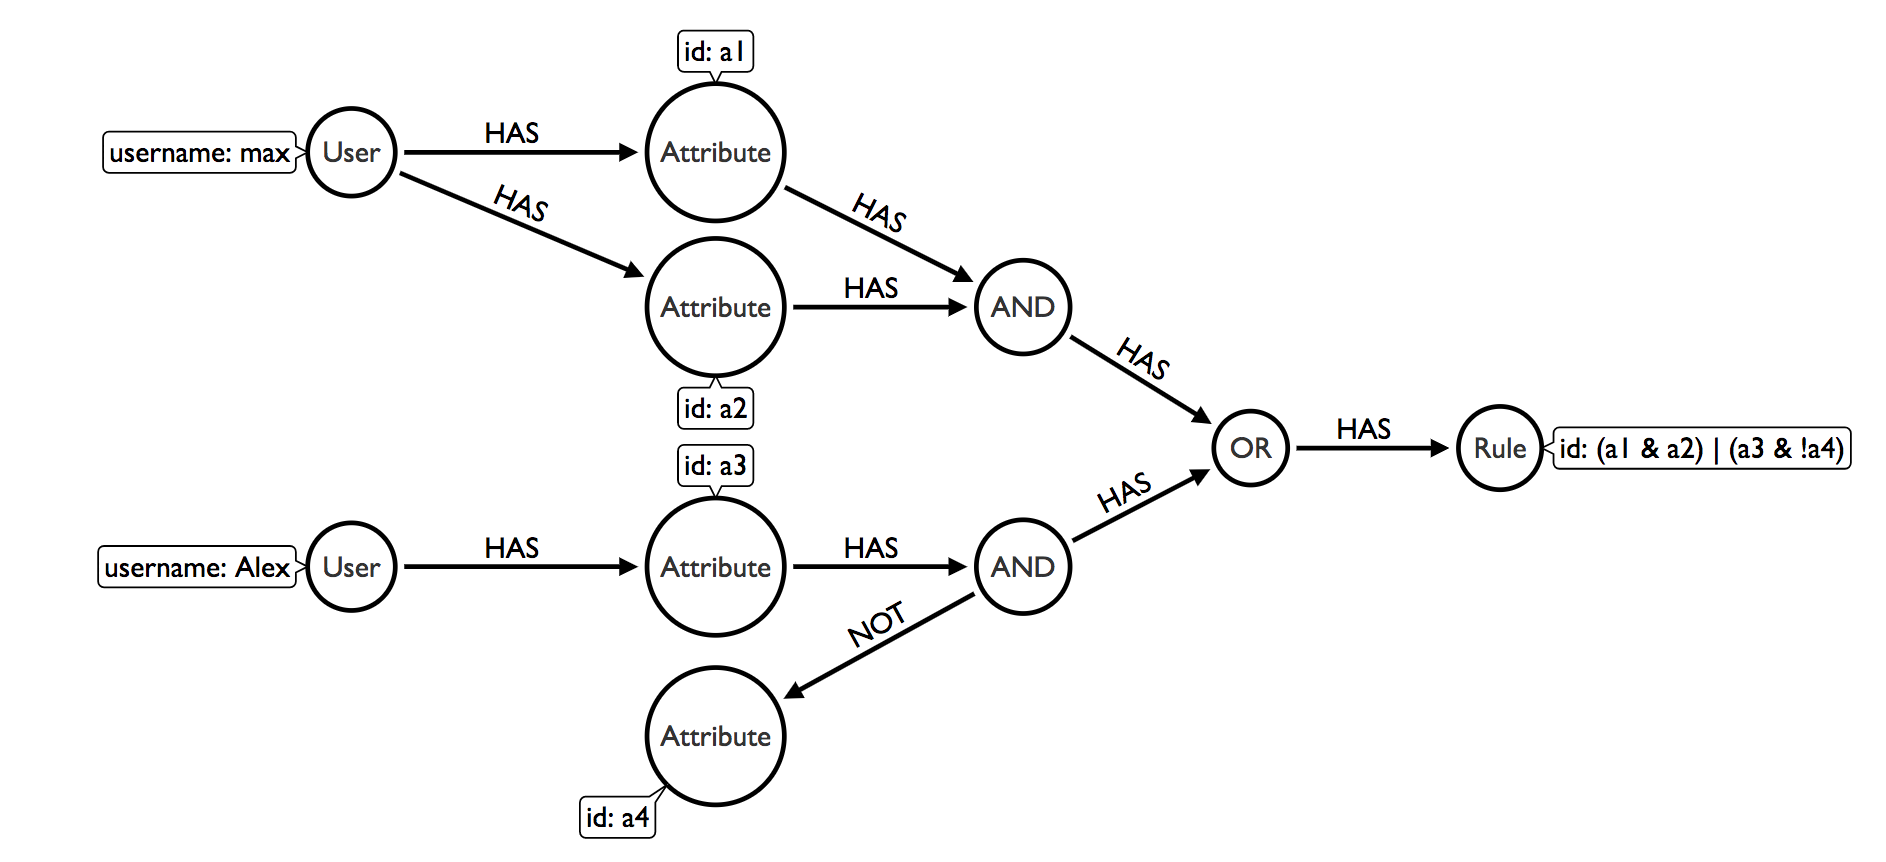 Building a Boolean Logic Rules Engine in Neo4j | Max De Marzi